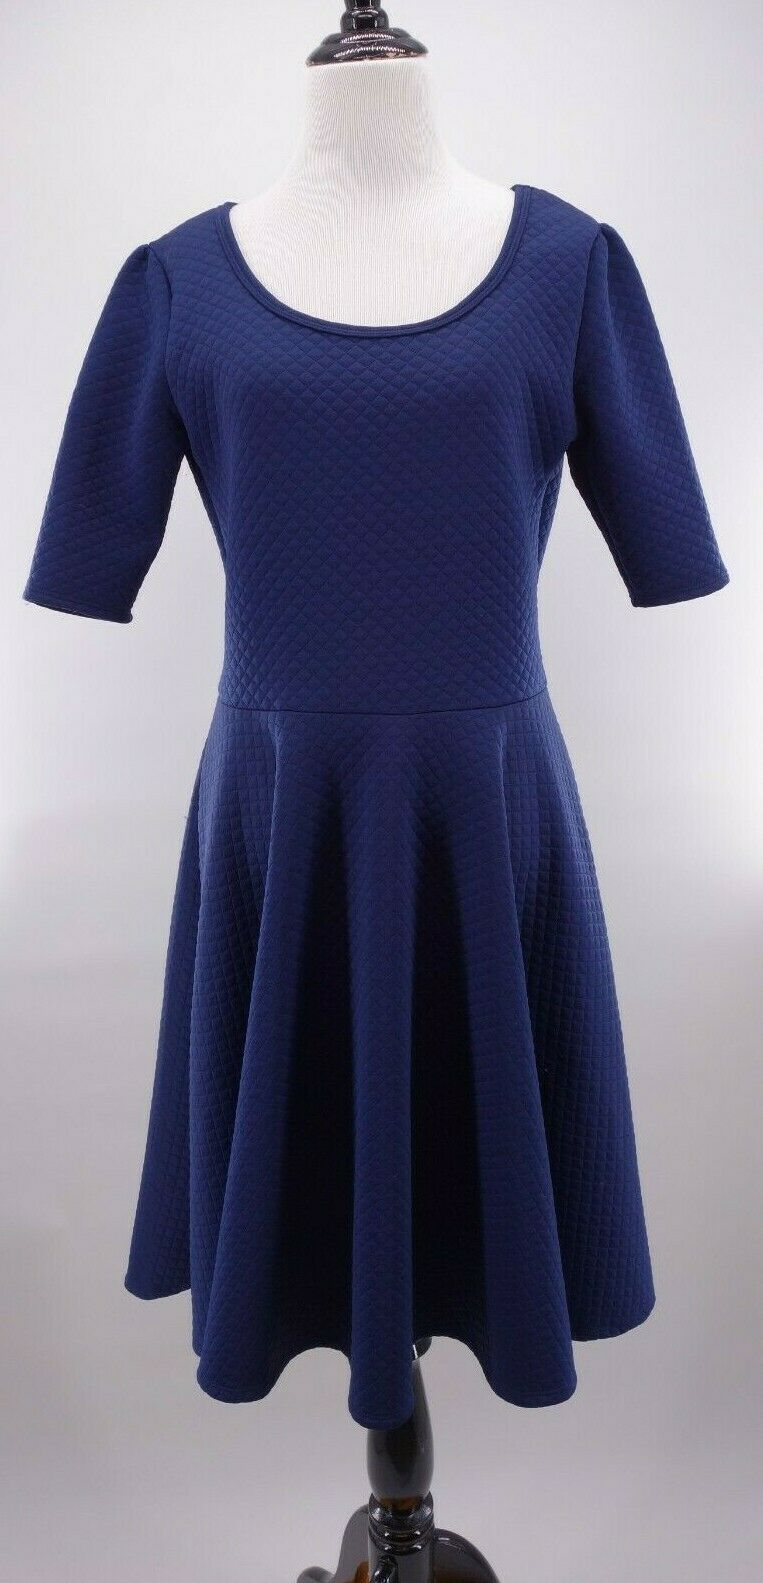 LuLaRoe Größe Large Solid Navy Blau Quilted Fabric Nicole Tea Fit & Flare Dress